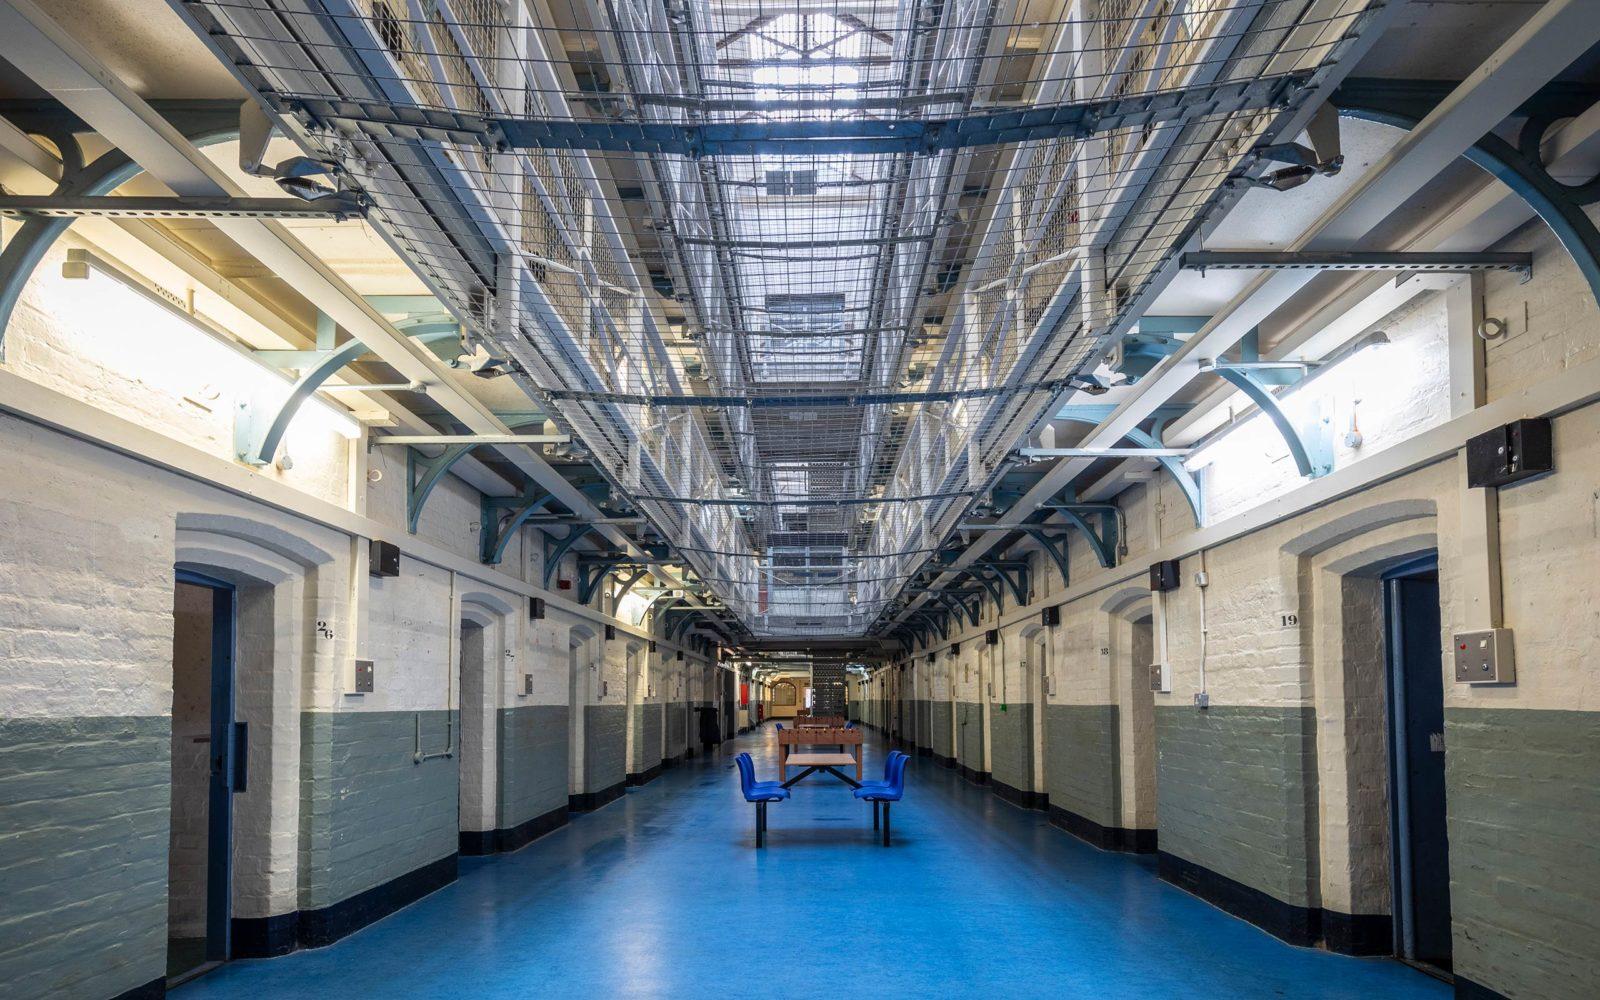 Shrewsbury Prison Special Events | Shrewsbury Prison Exhibitions